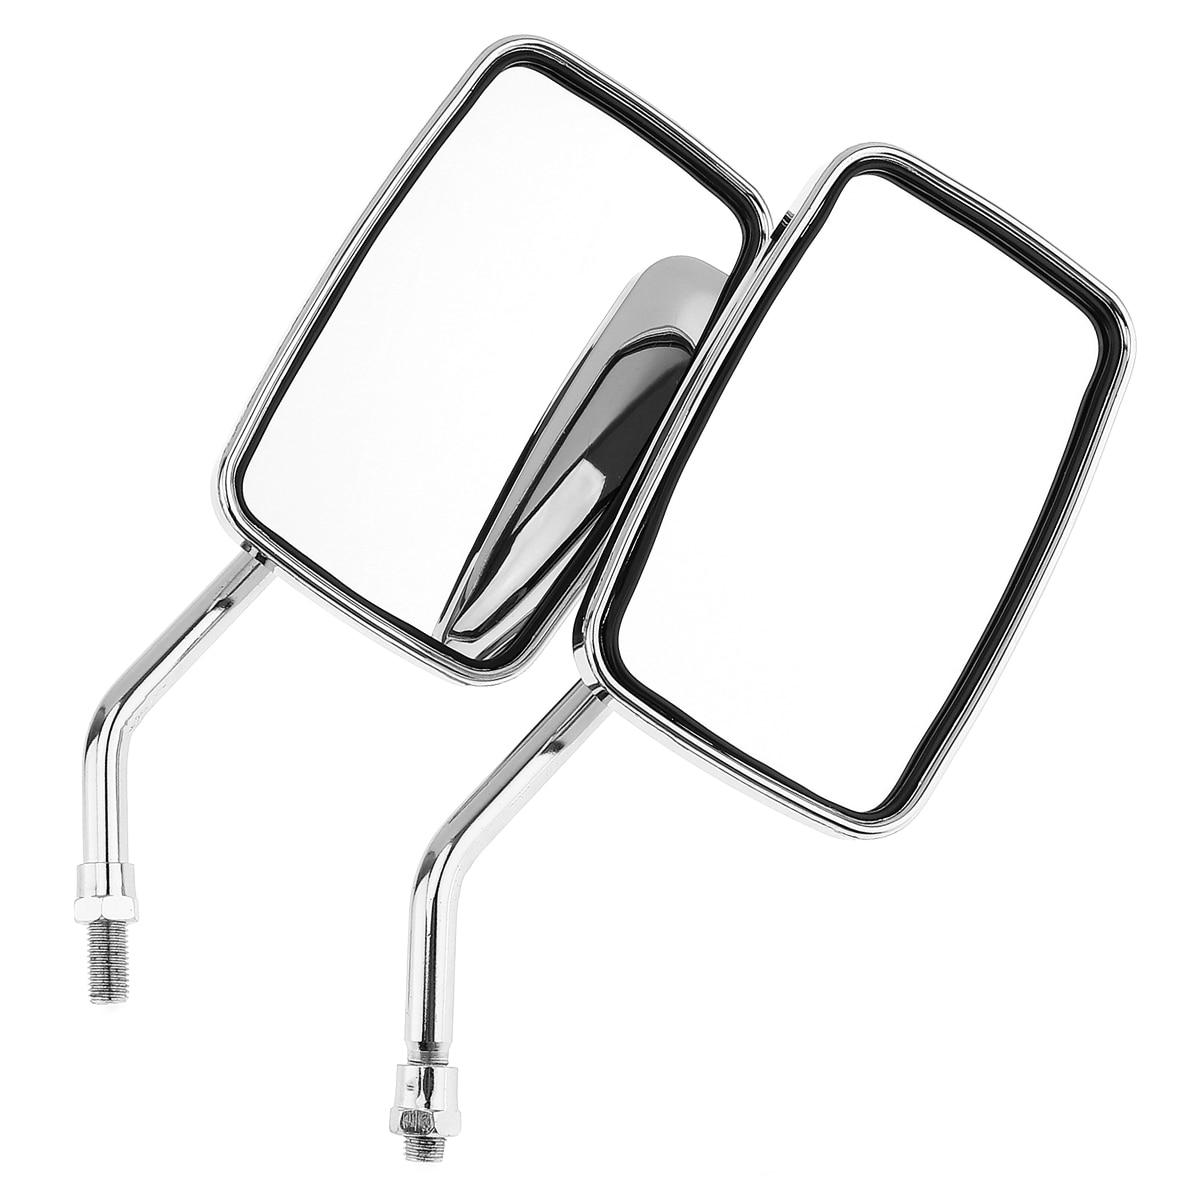 цена на 2pcs Universal 10mm Modified Plated Universal Motorcycle Handlebar Mirror Motorbike Side Mirrors Rearview Wide Angle Mirror